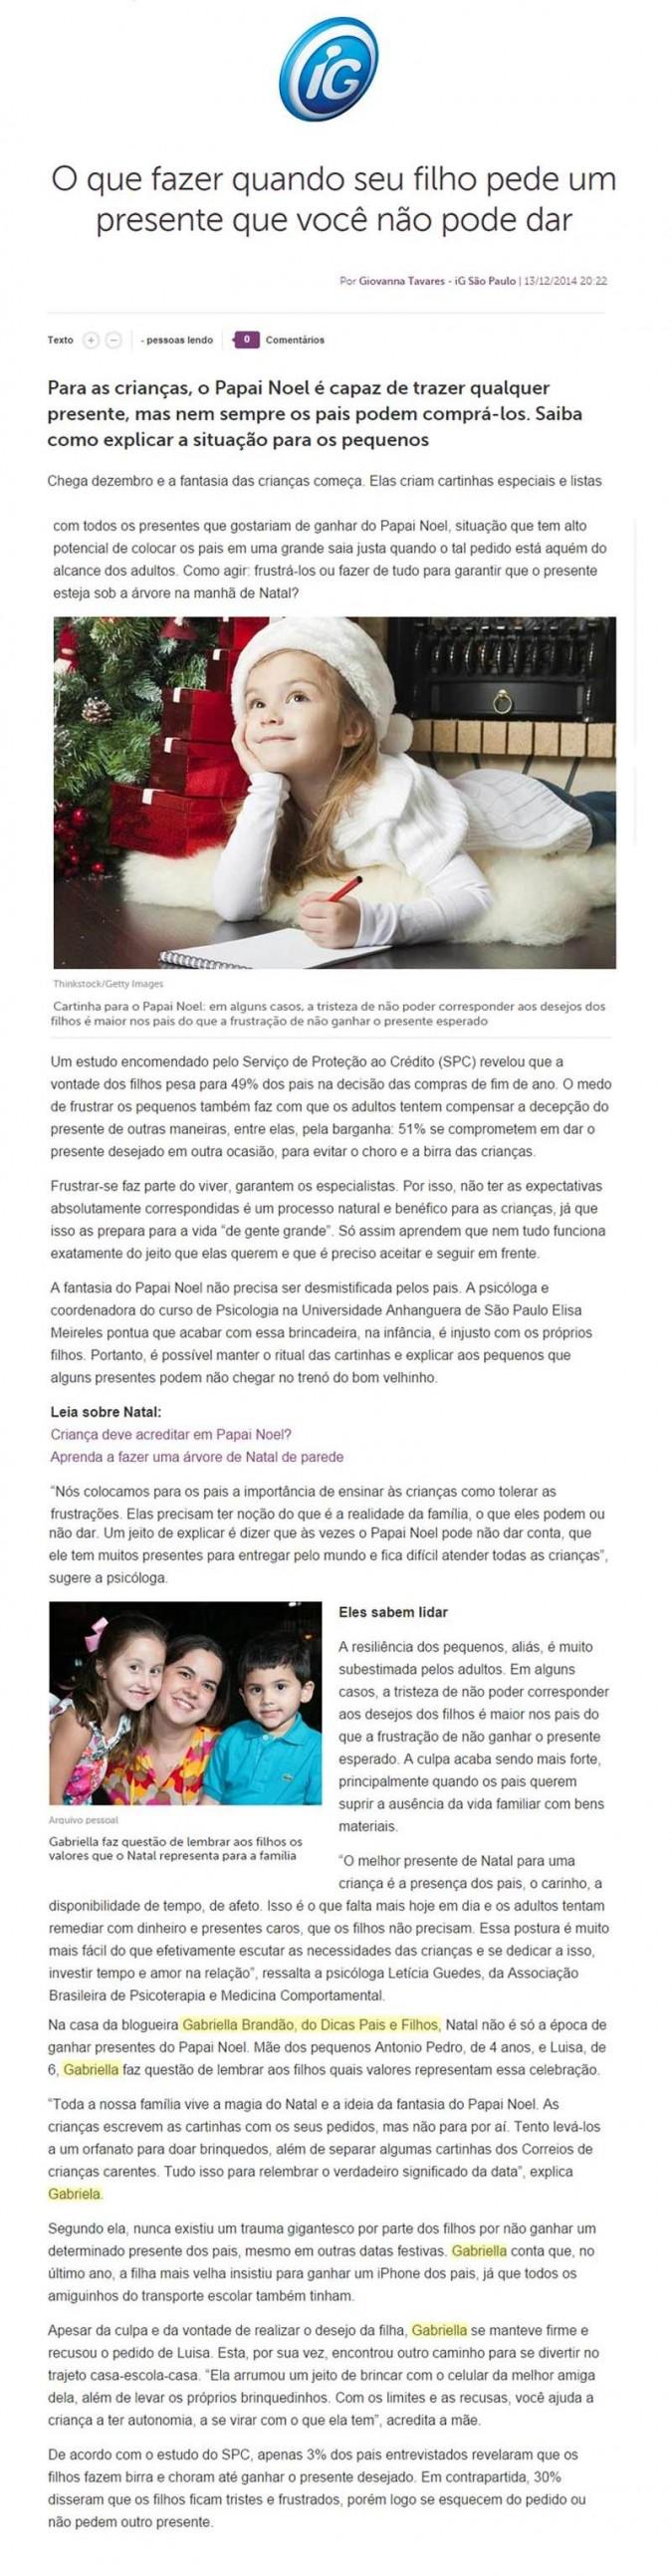 Portal IG Filhos 15/12/2014